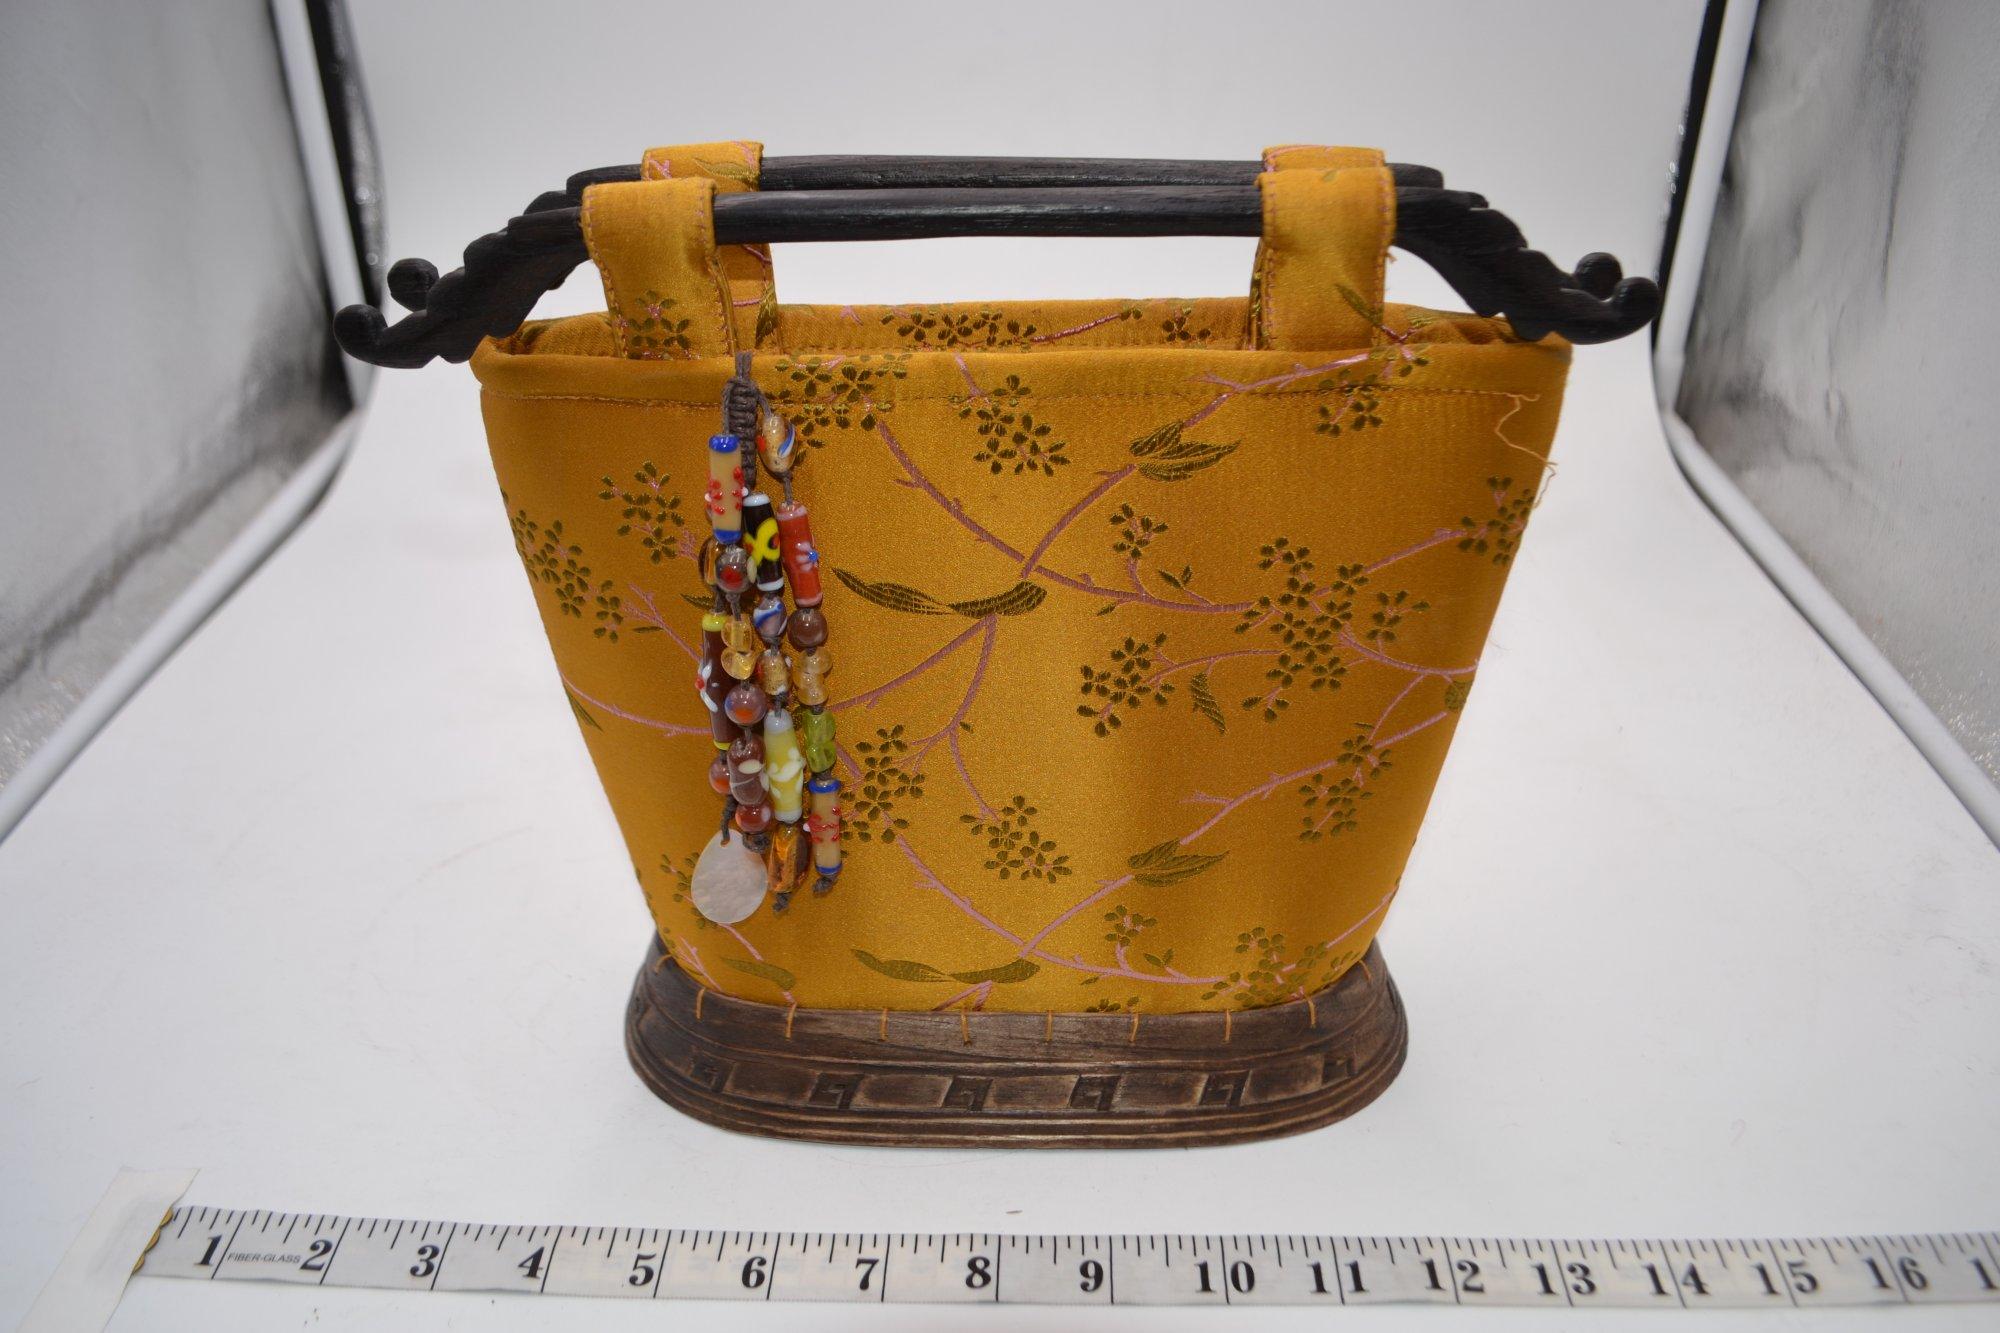 20th Century Chinese Handbag - PXY